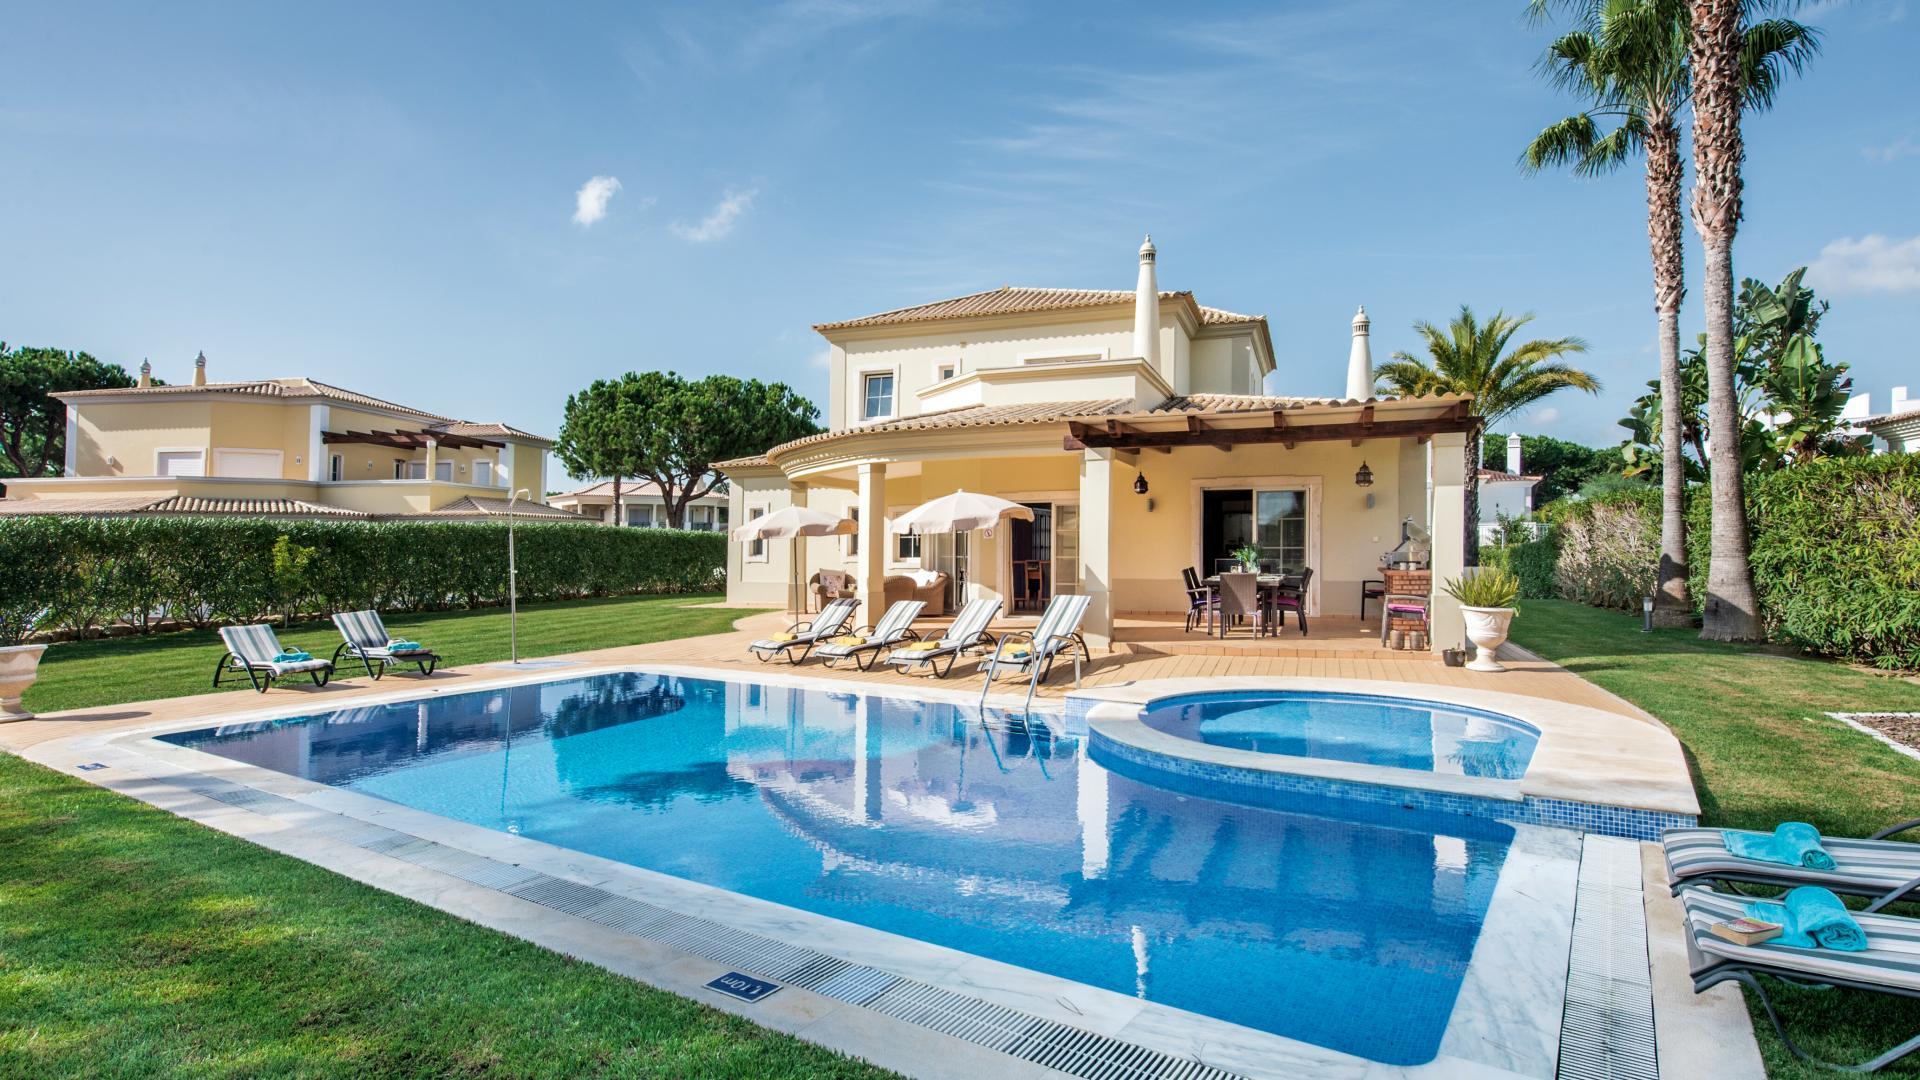 Villa Pukkaputt - Vila Sol, Vilamoura & Quarteira, Algarve - 1.png